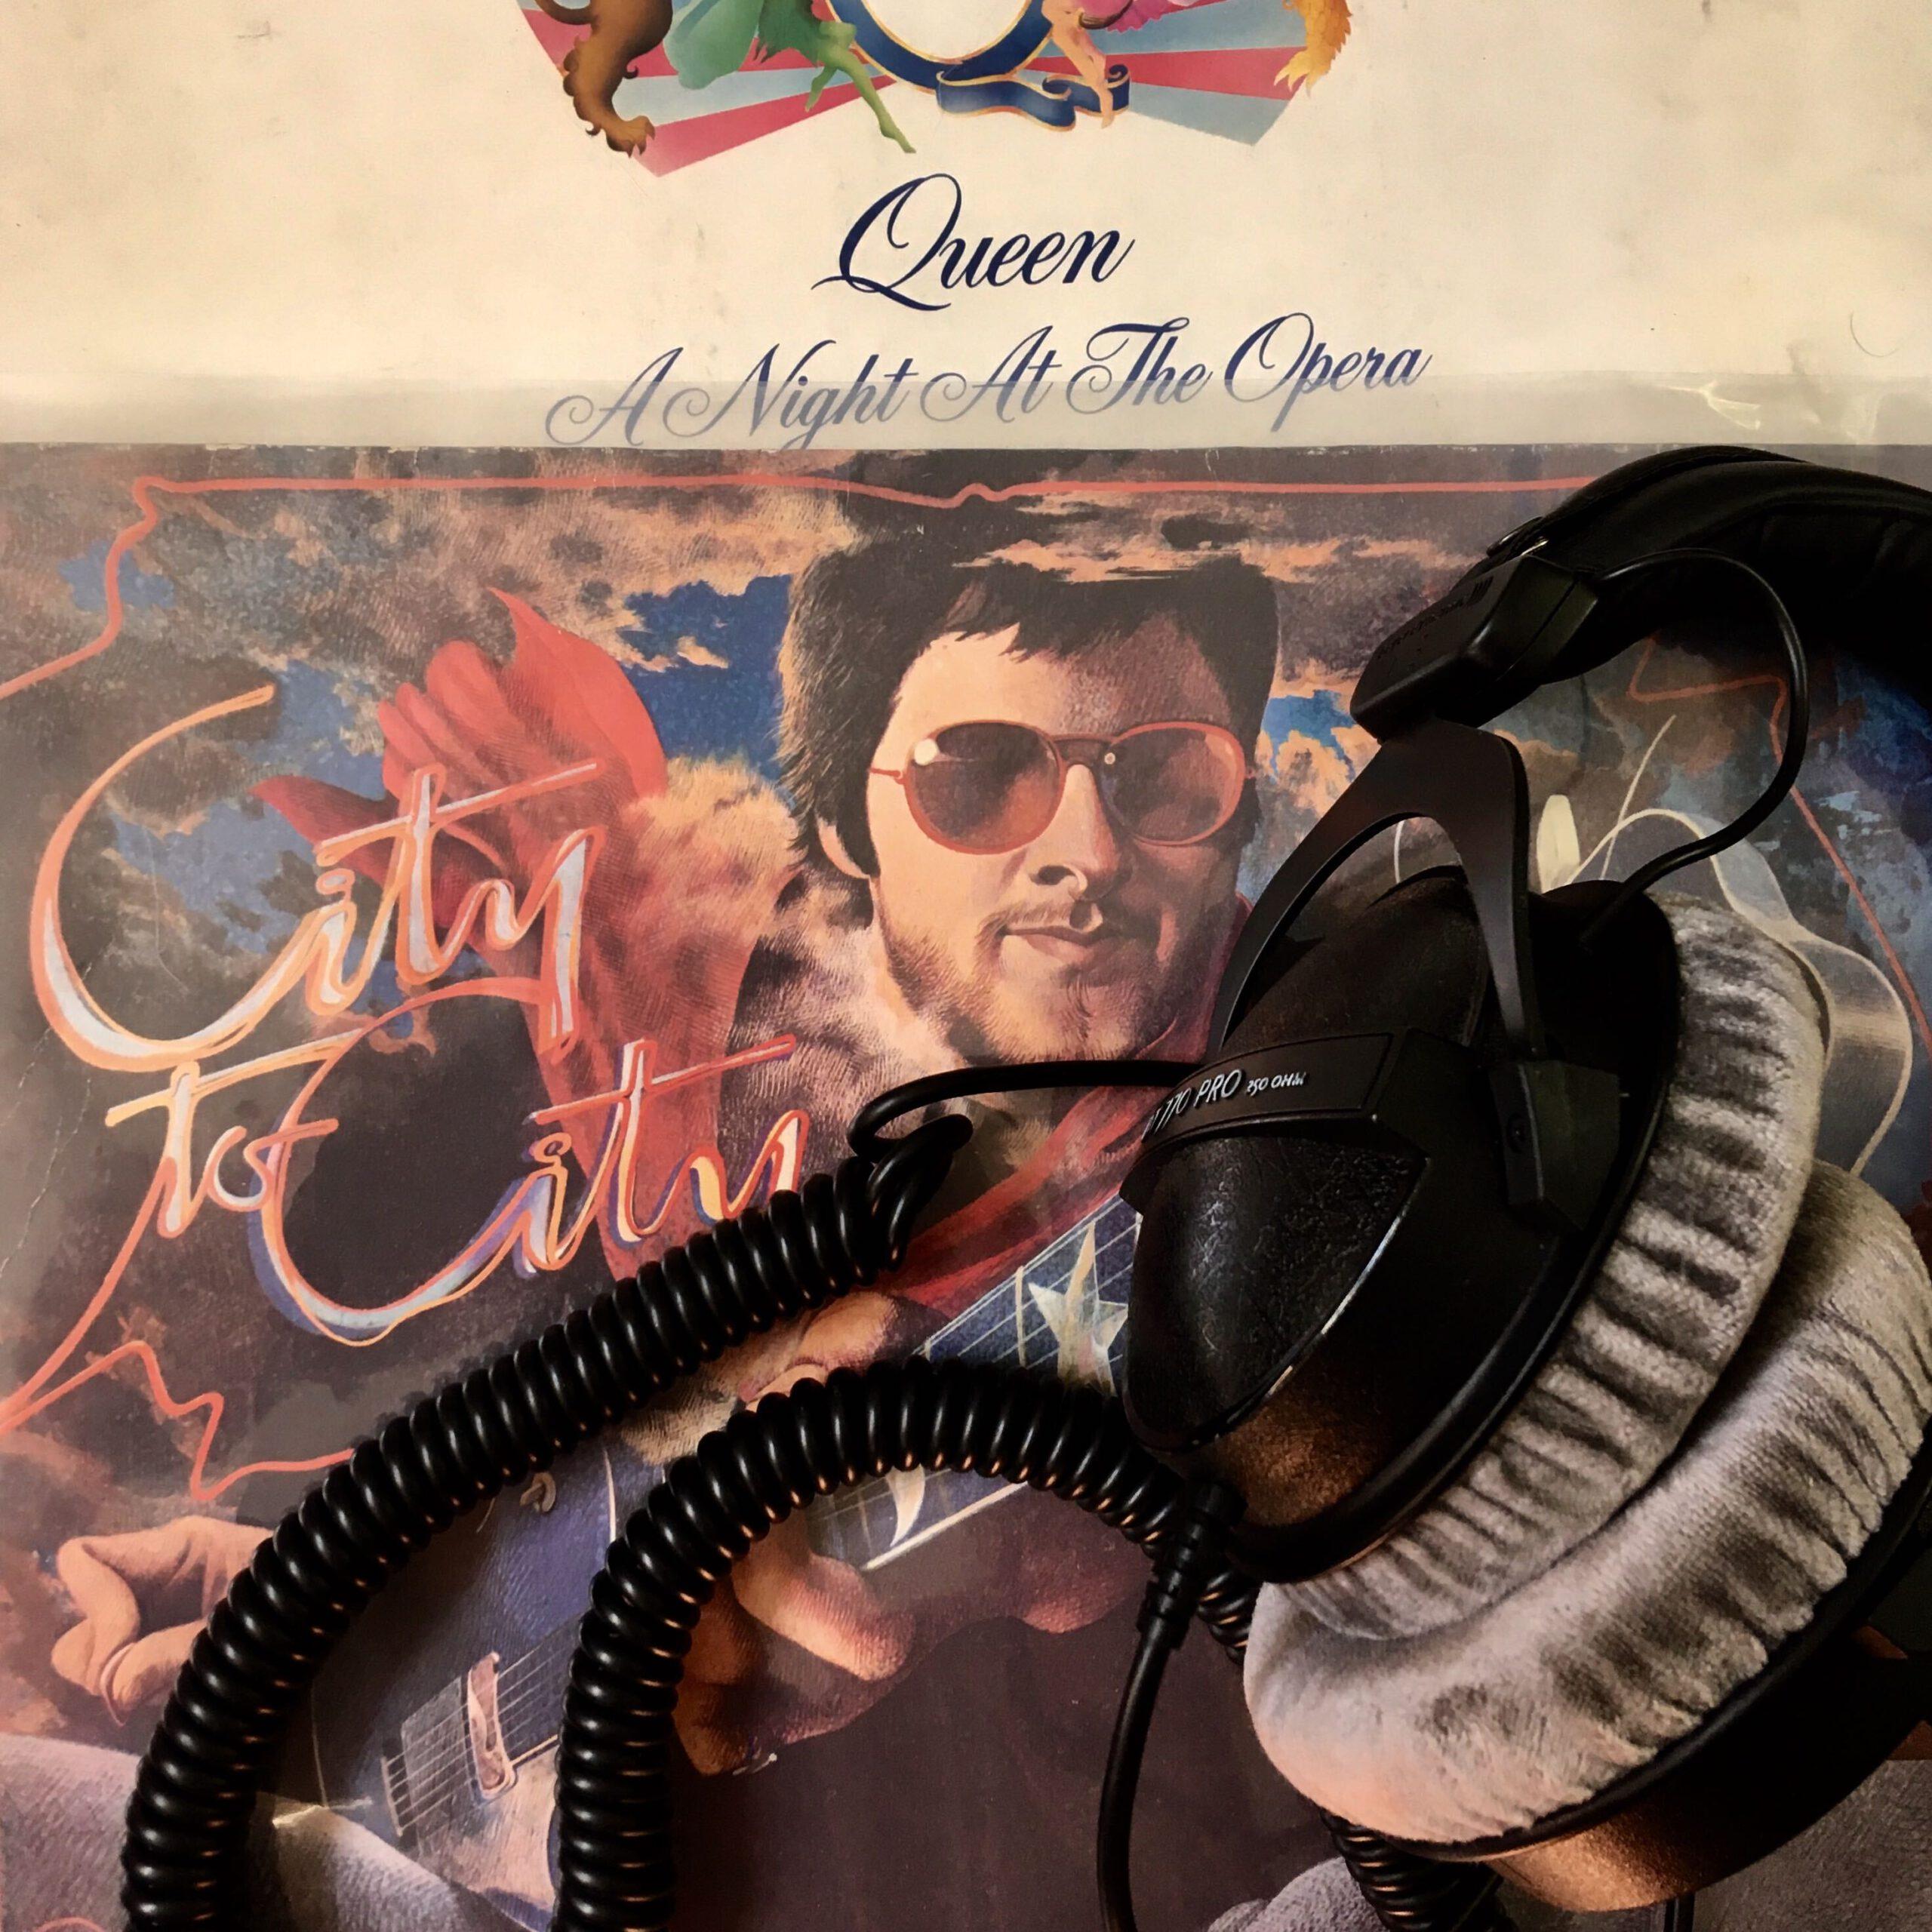 Plattencover mit Kopfhörern